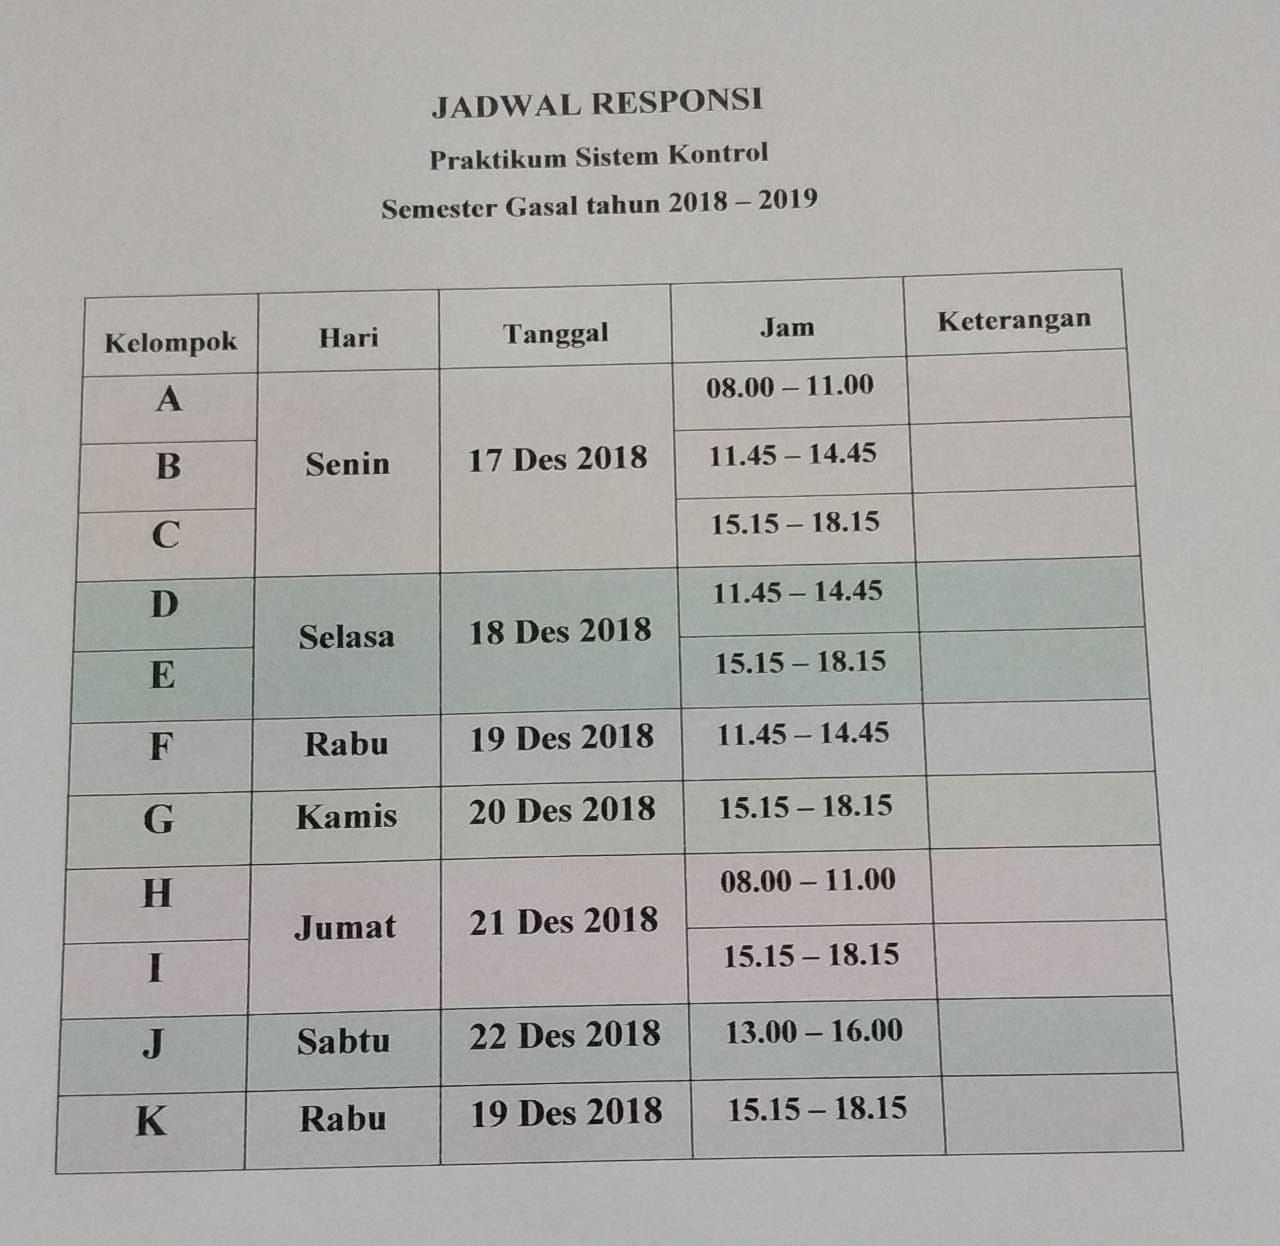 Jadwal Responsi Praktikum Sistem kontrol (PLC) 2018